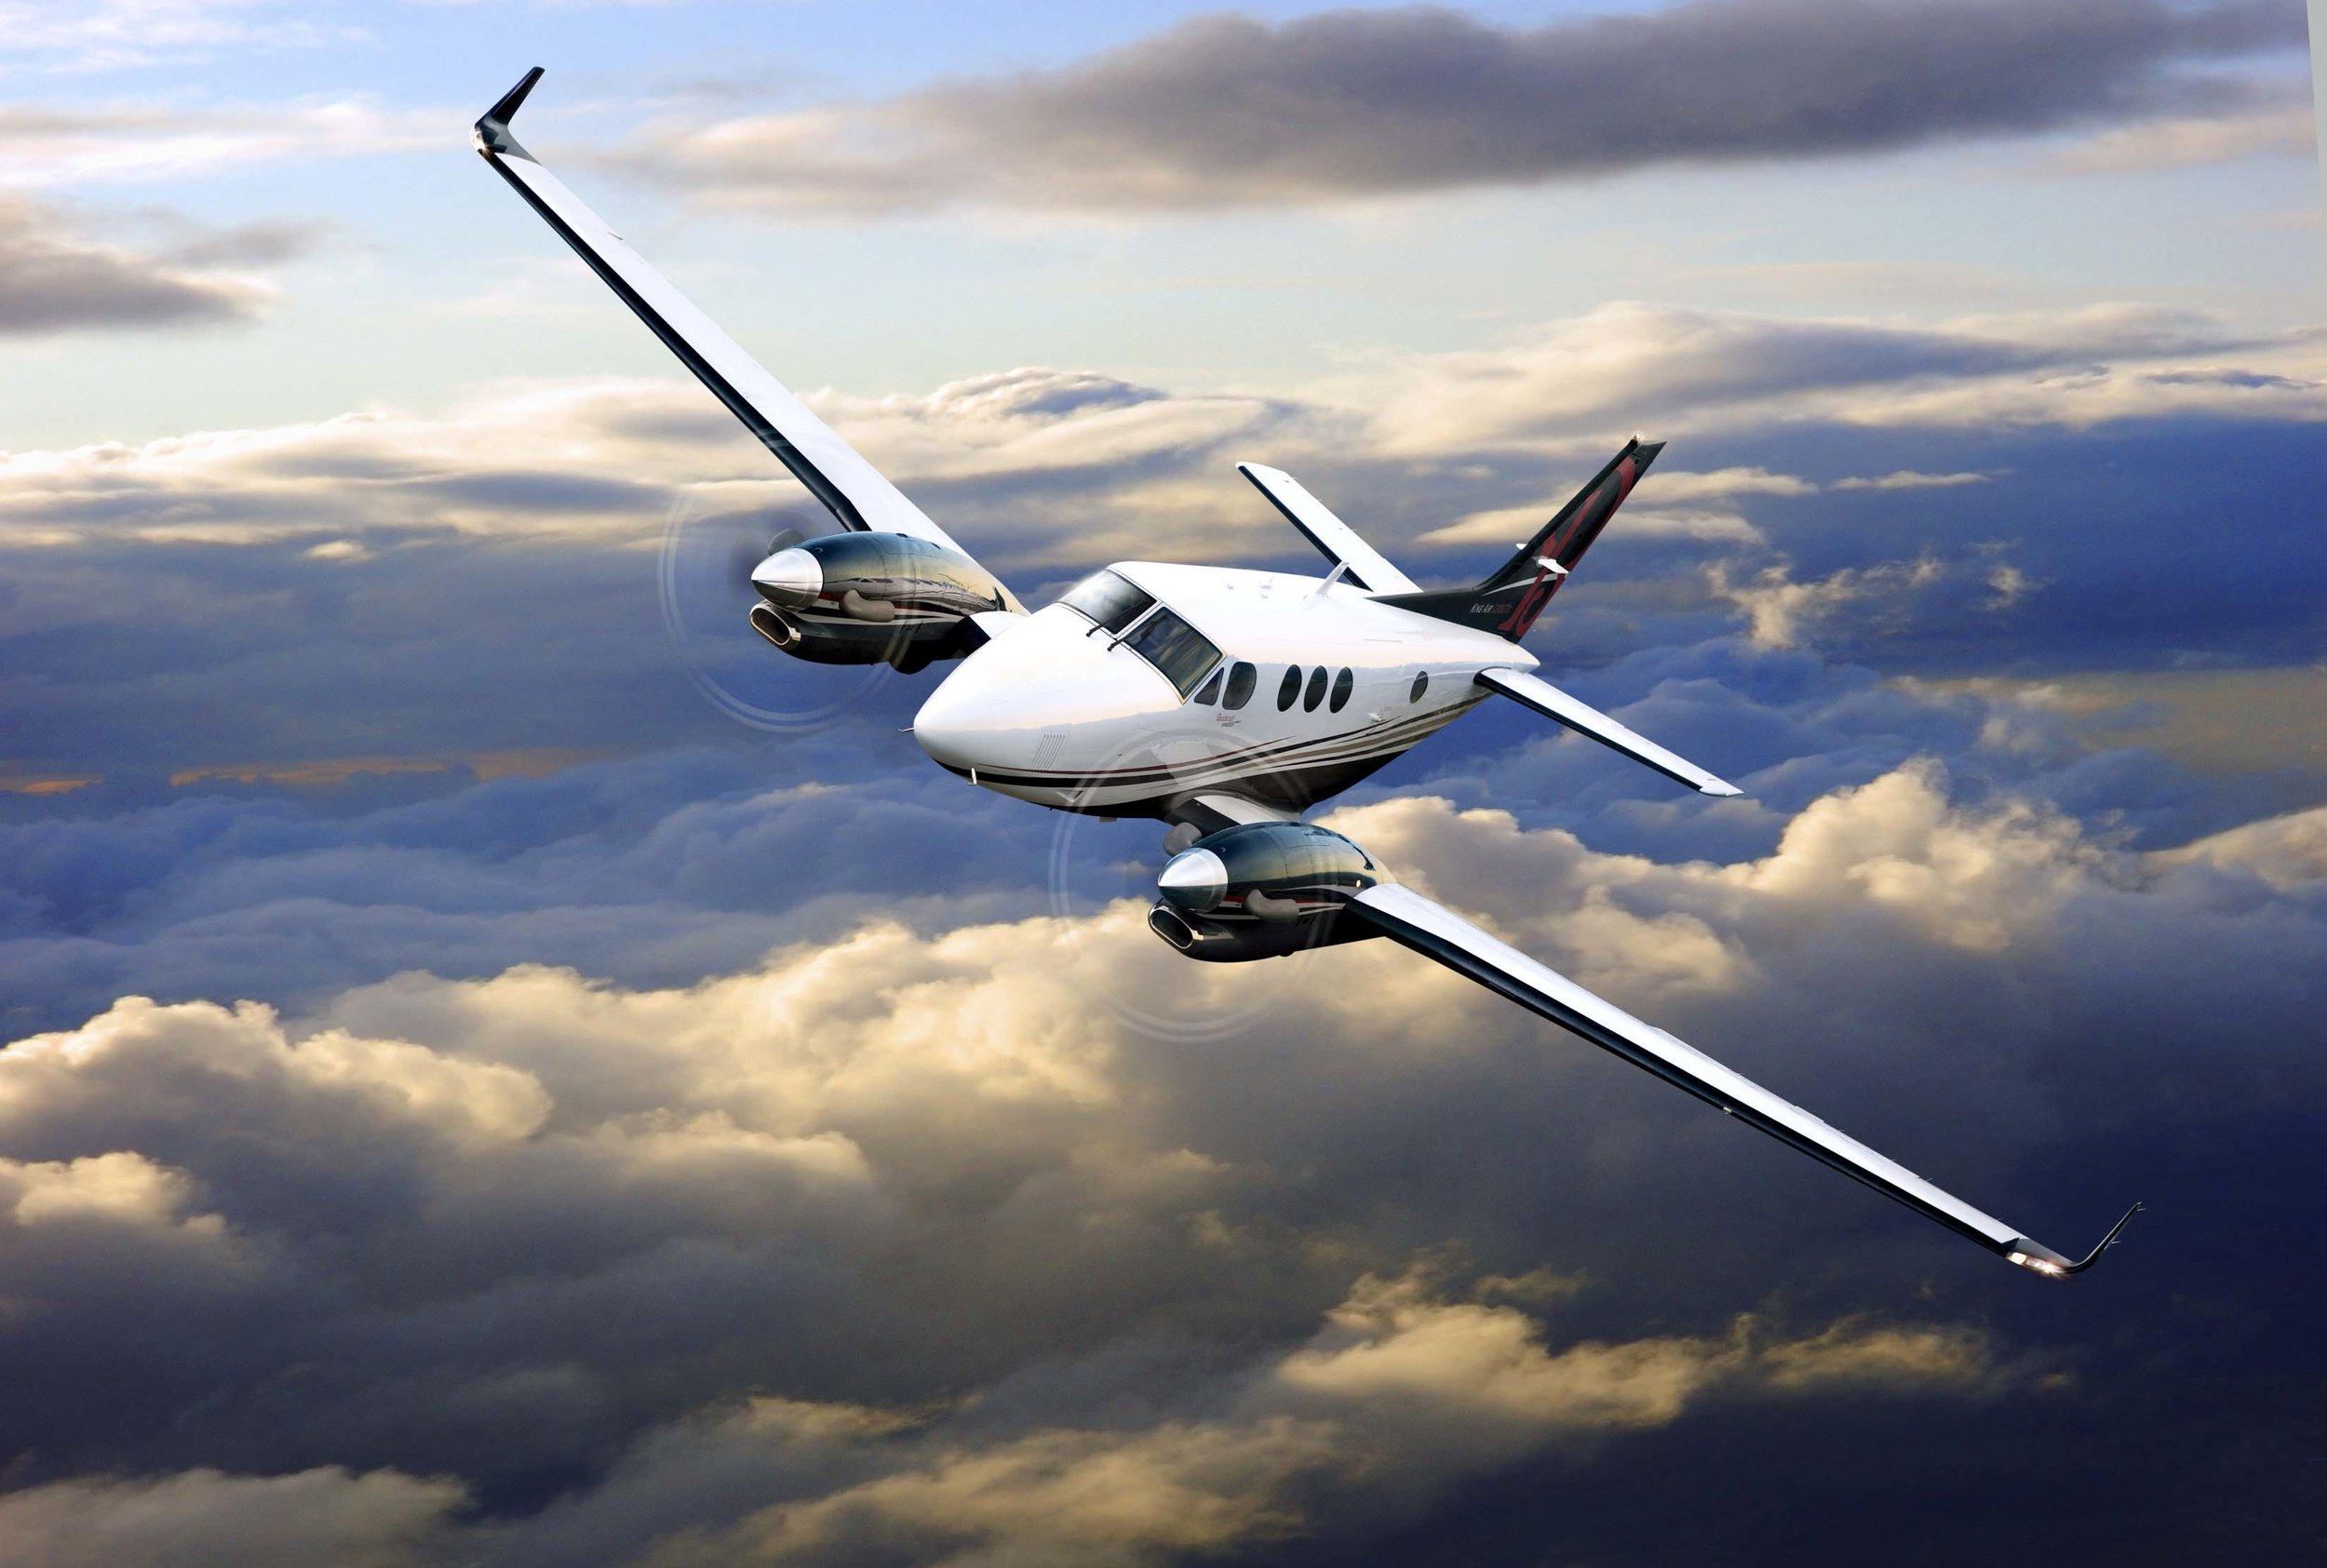 Beechcraft King Air C90GTx Aerial.jpg